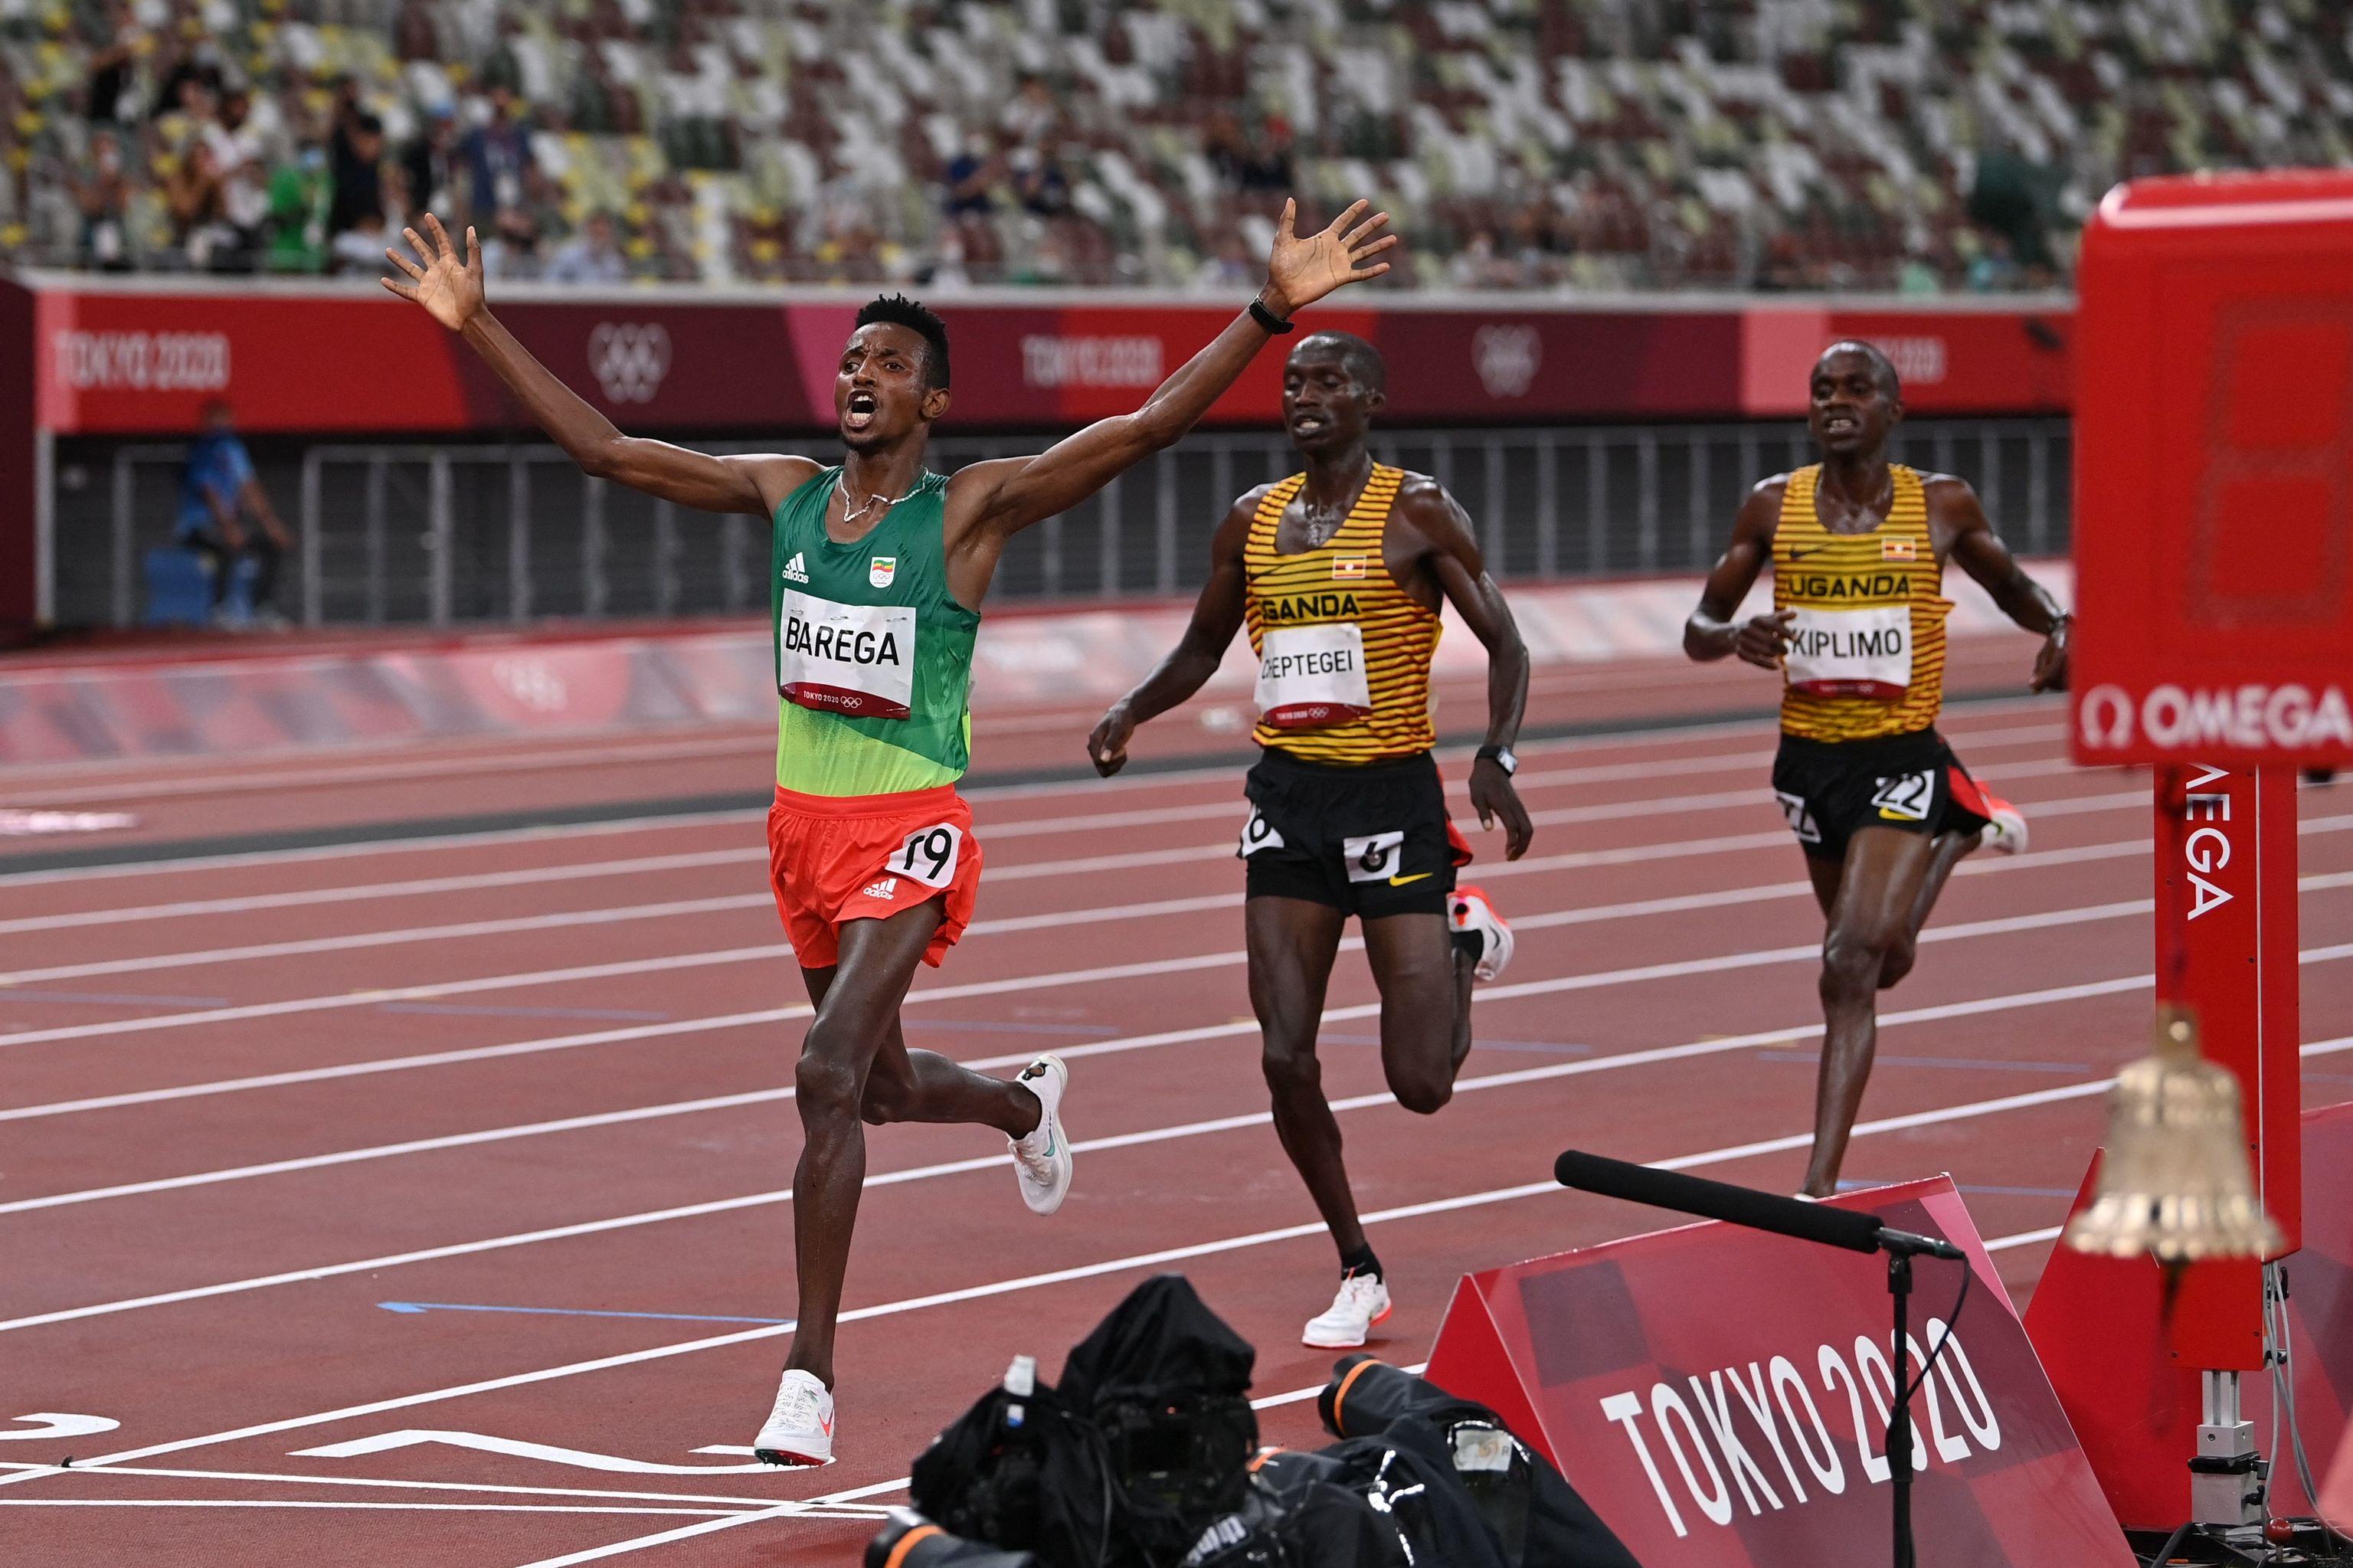 Barega Etiopía - atletismo - Juegos Olímpicos 2021 - Tokio 2020